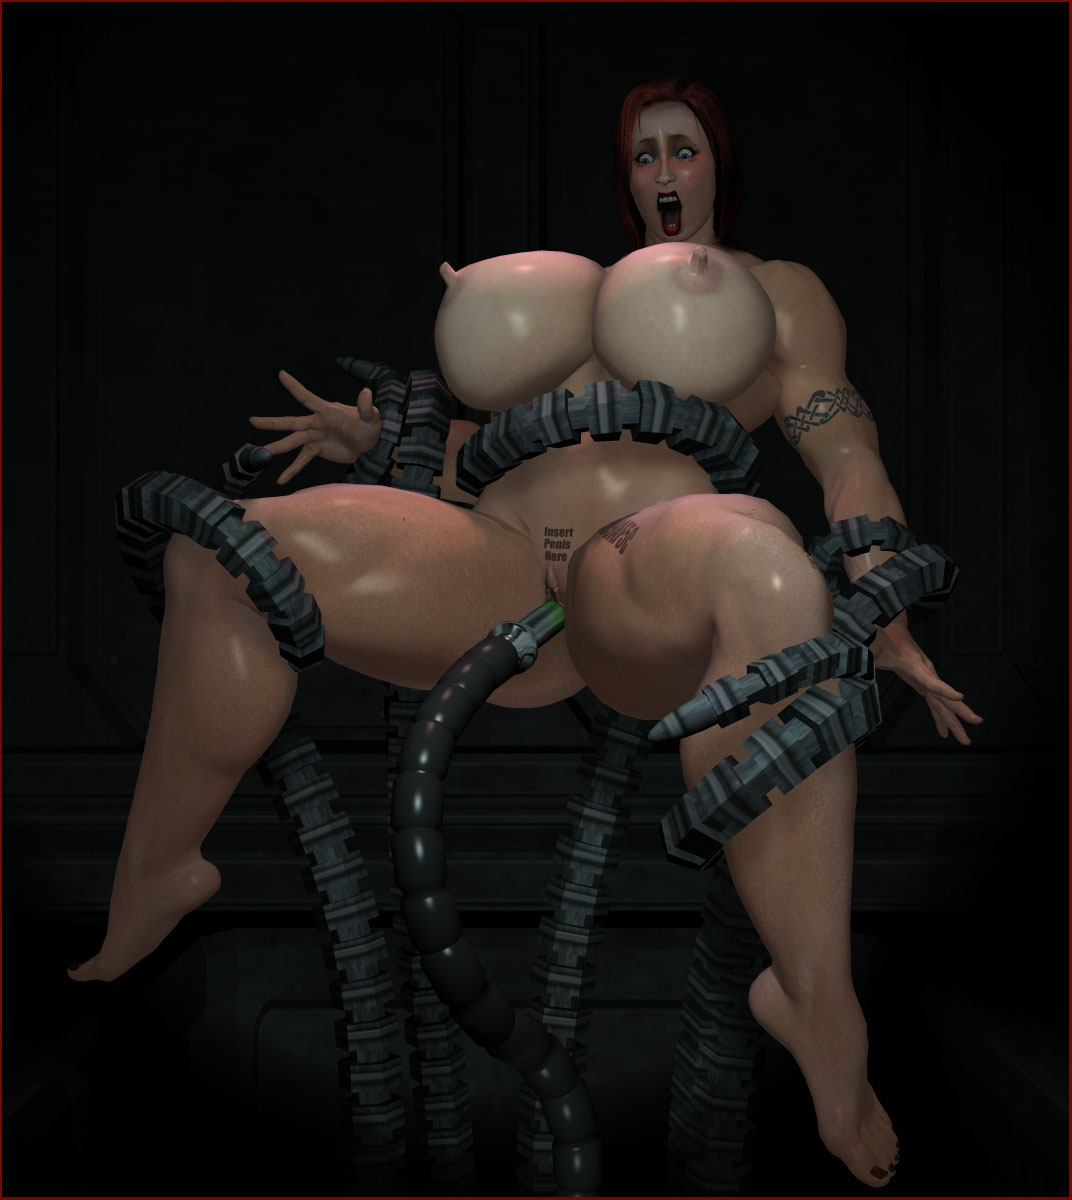 Hard anime tentacle porn xxx sex dvd hardcore movie